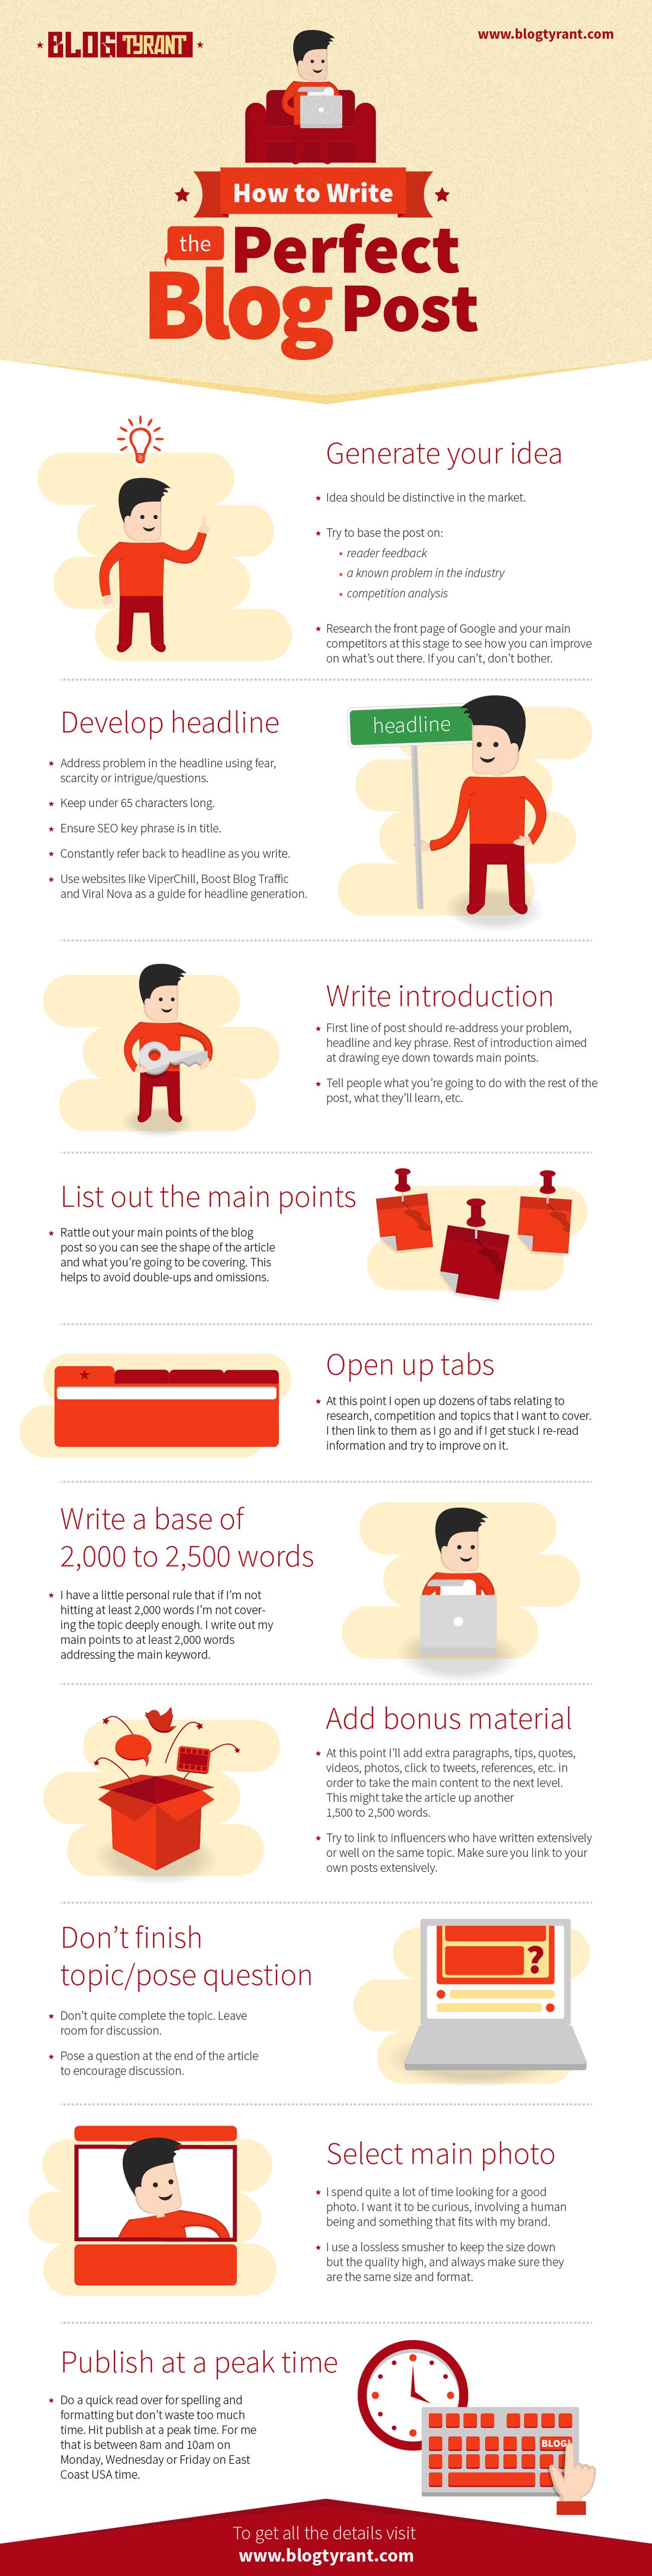 writing-brilliant-blogpost-infographic